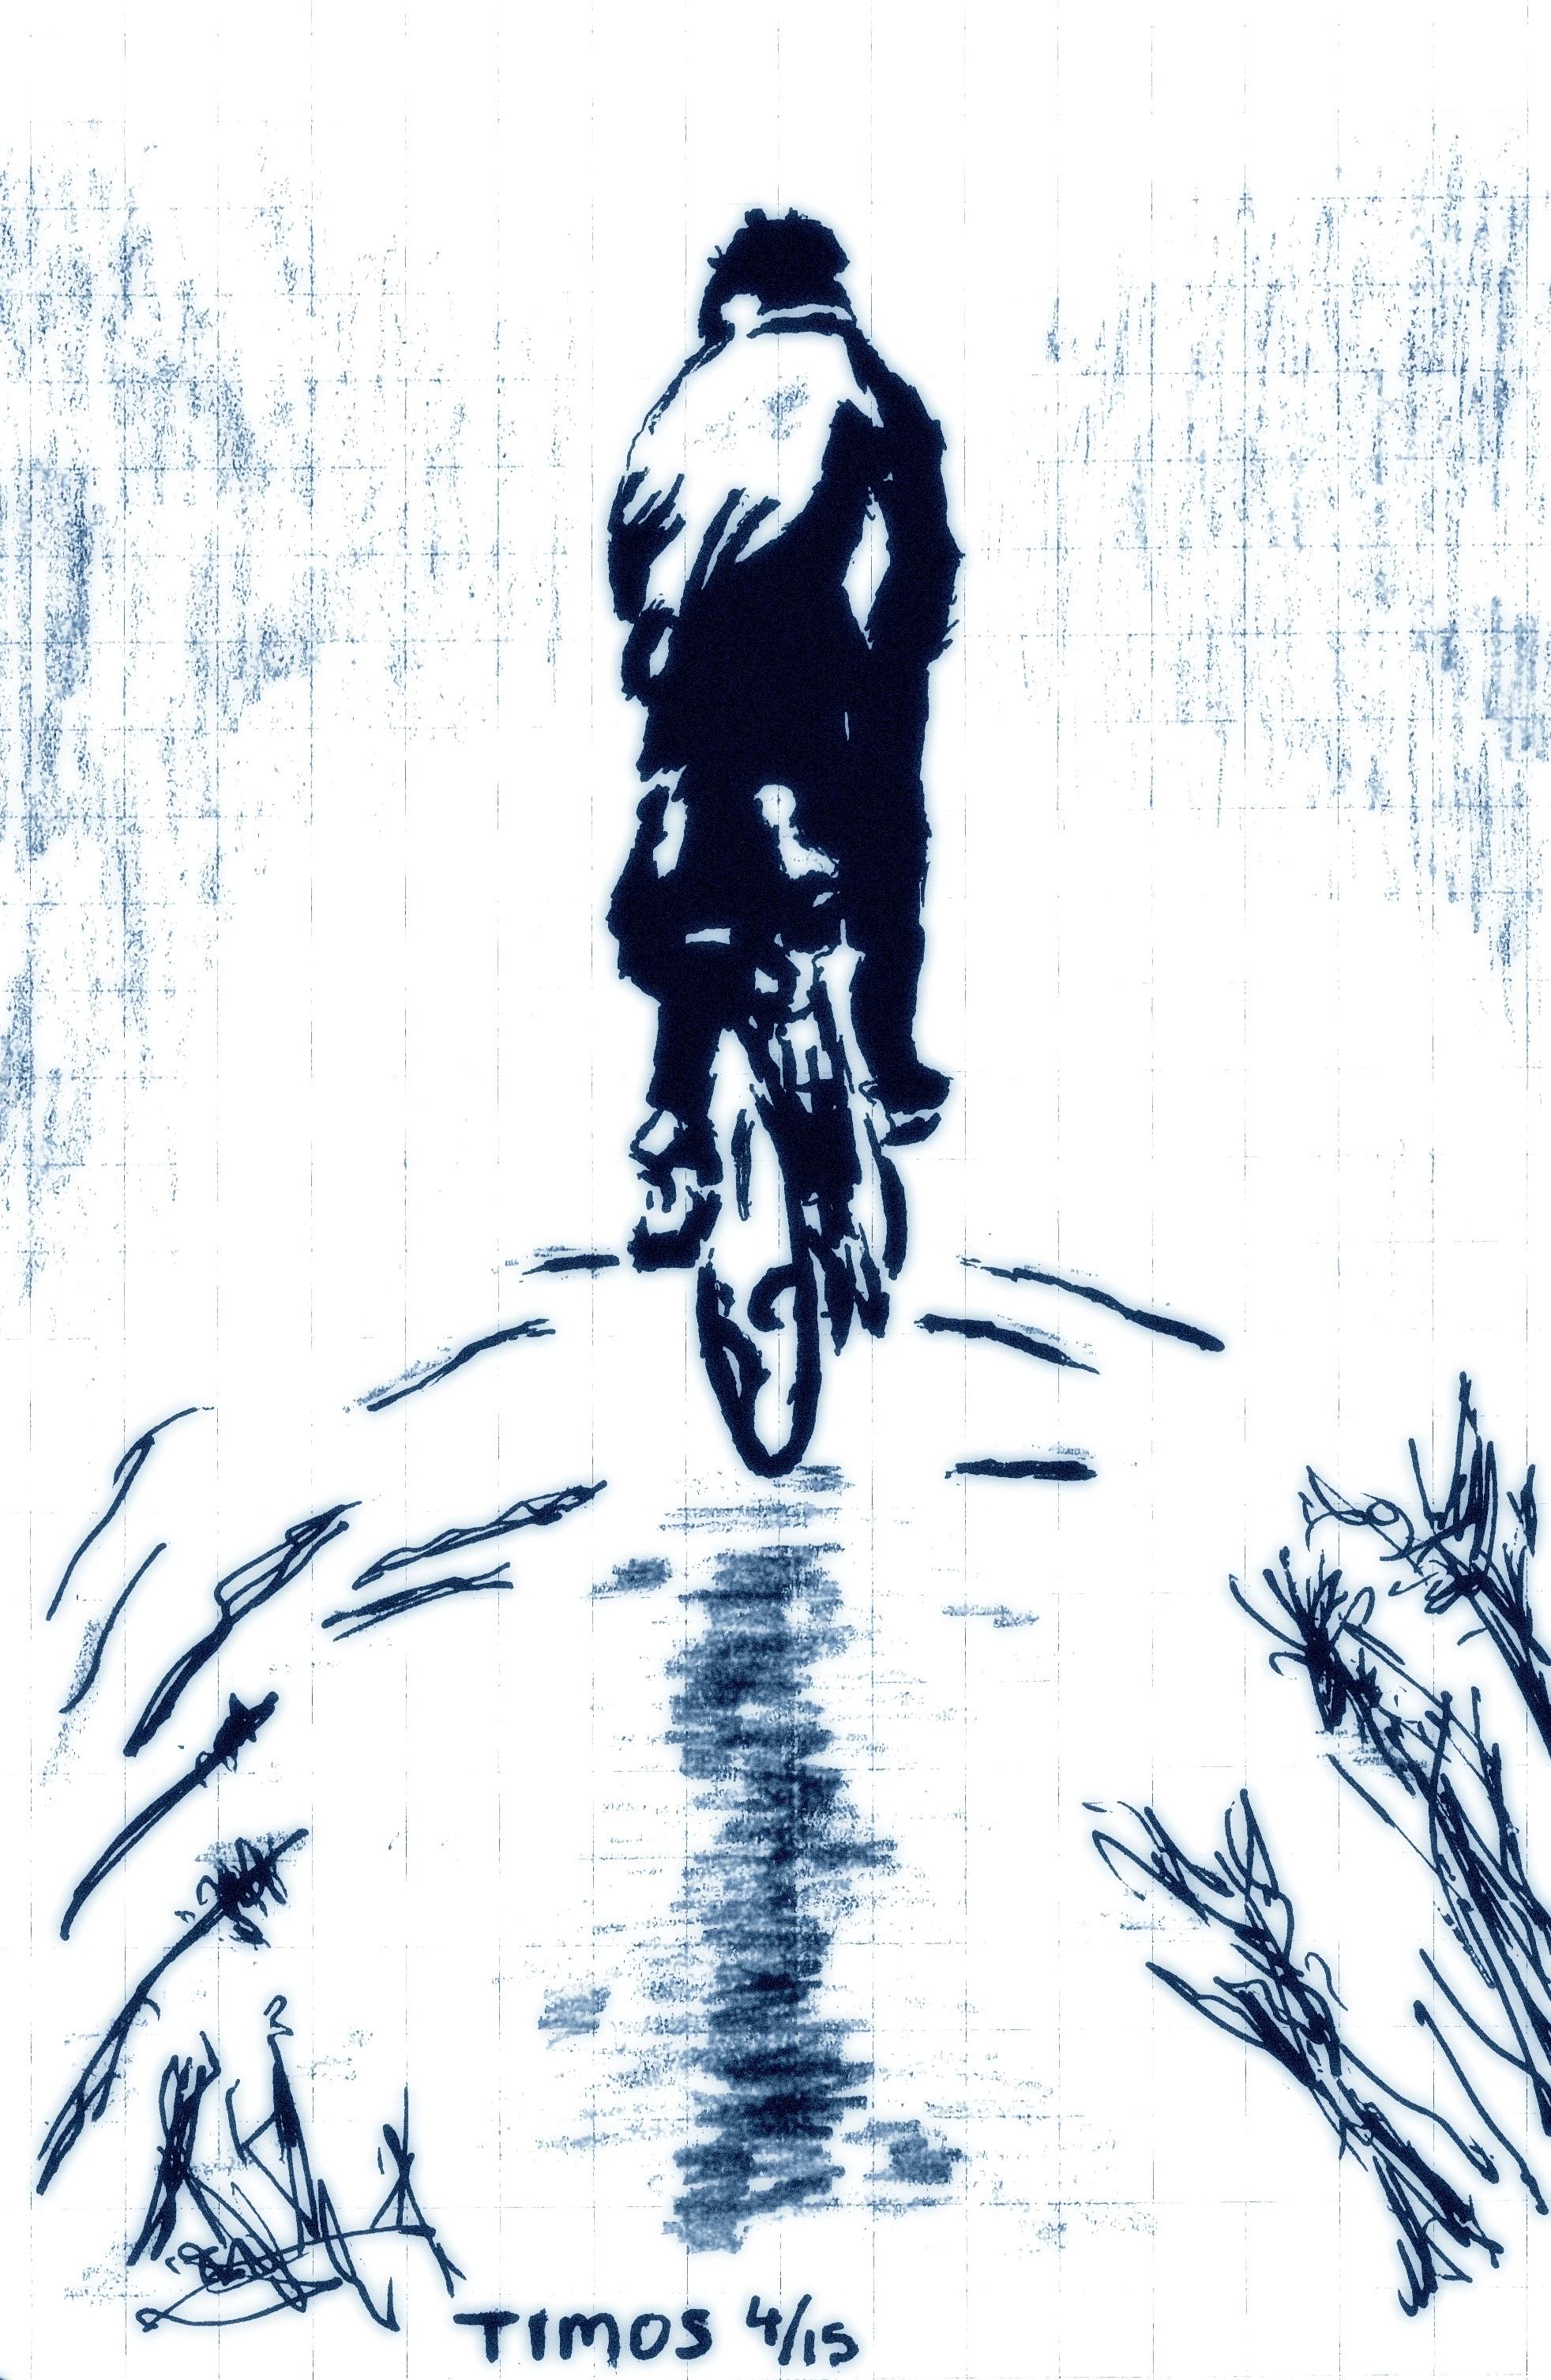 biker departing to eternal perdition